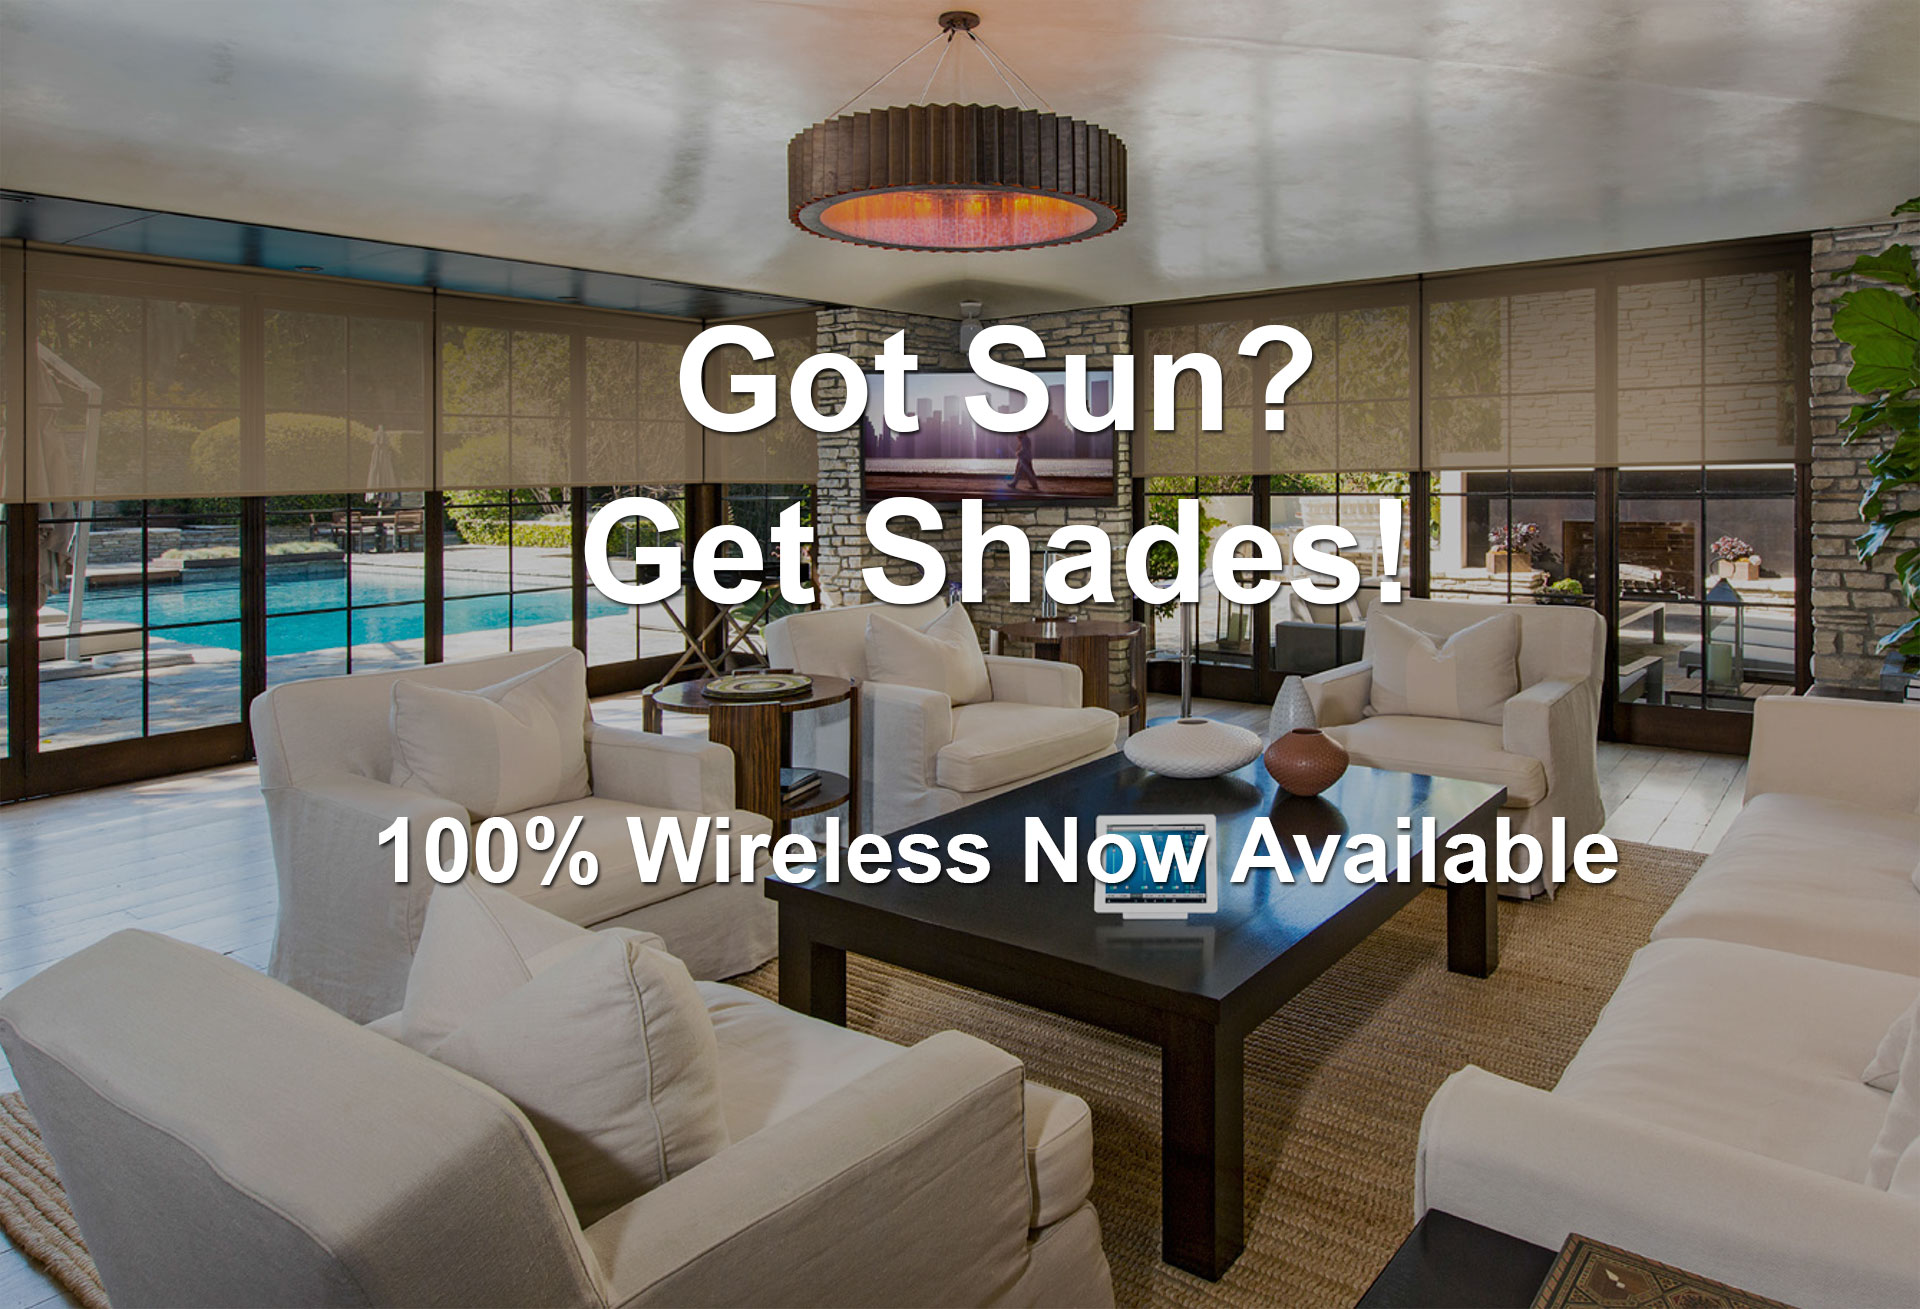 got-sun-get-shades-web.jpg